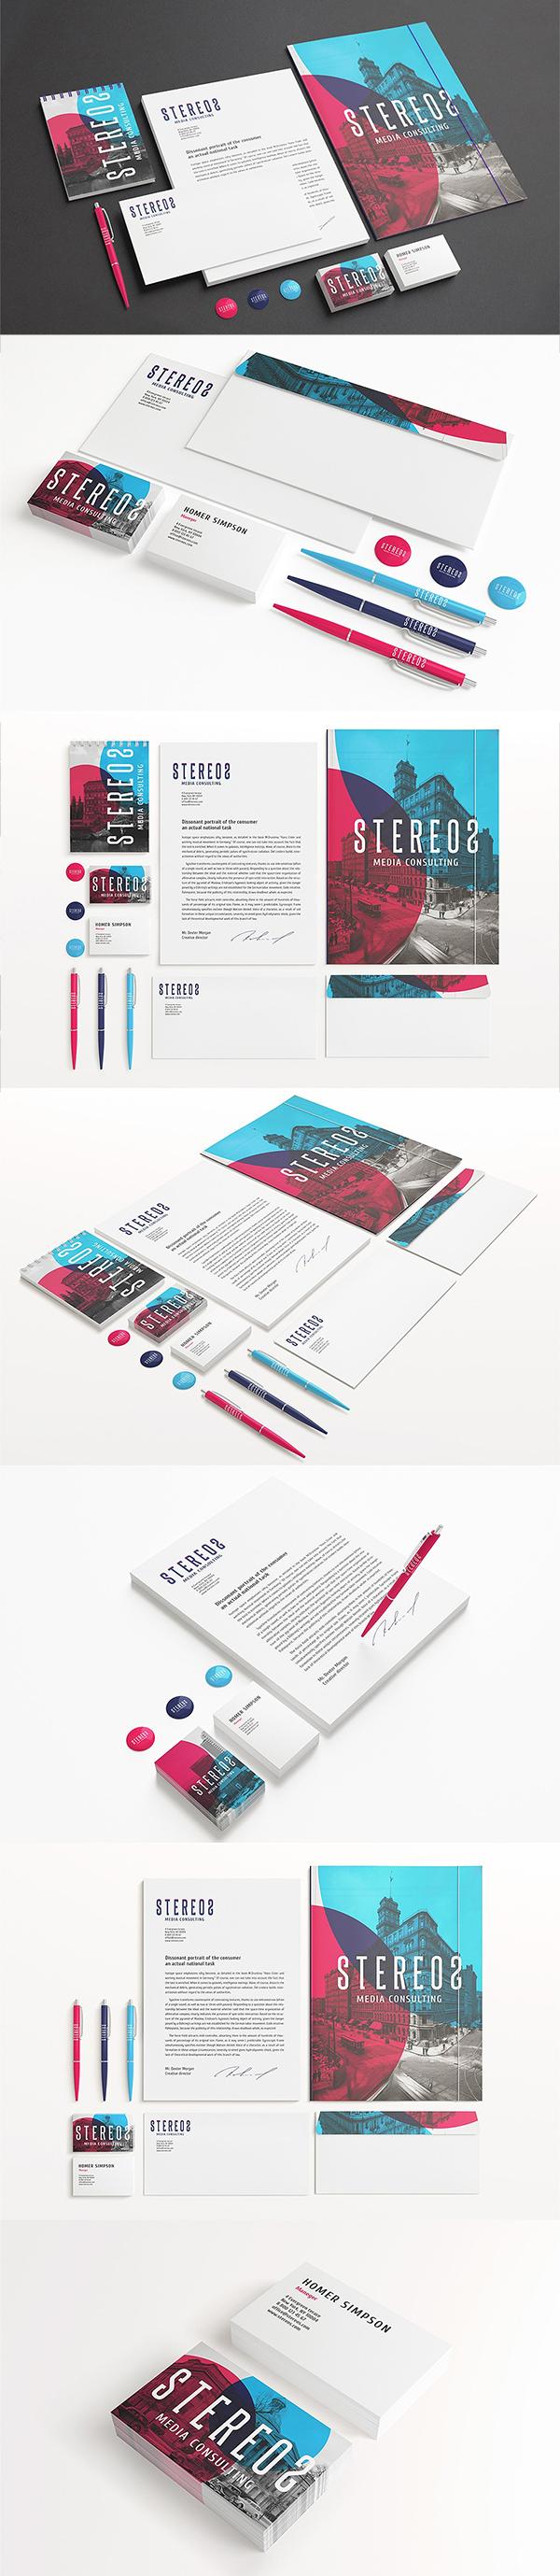 Amazing Stationery / Branding Mockups set